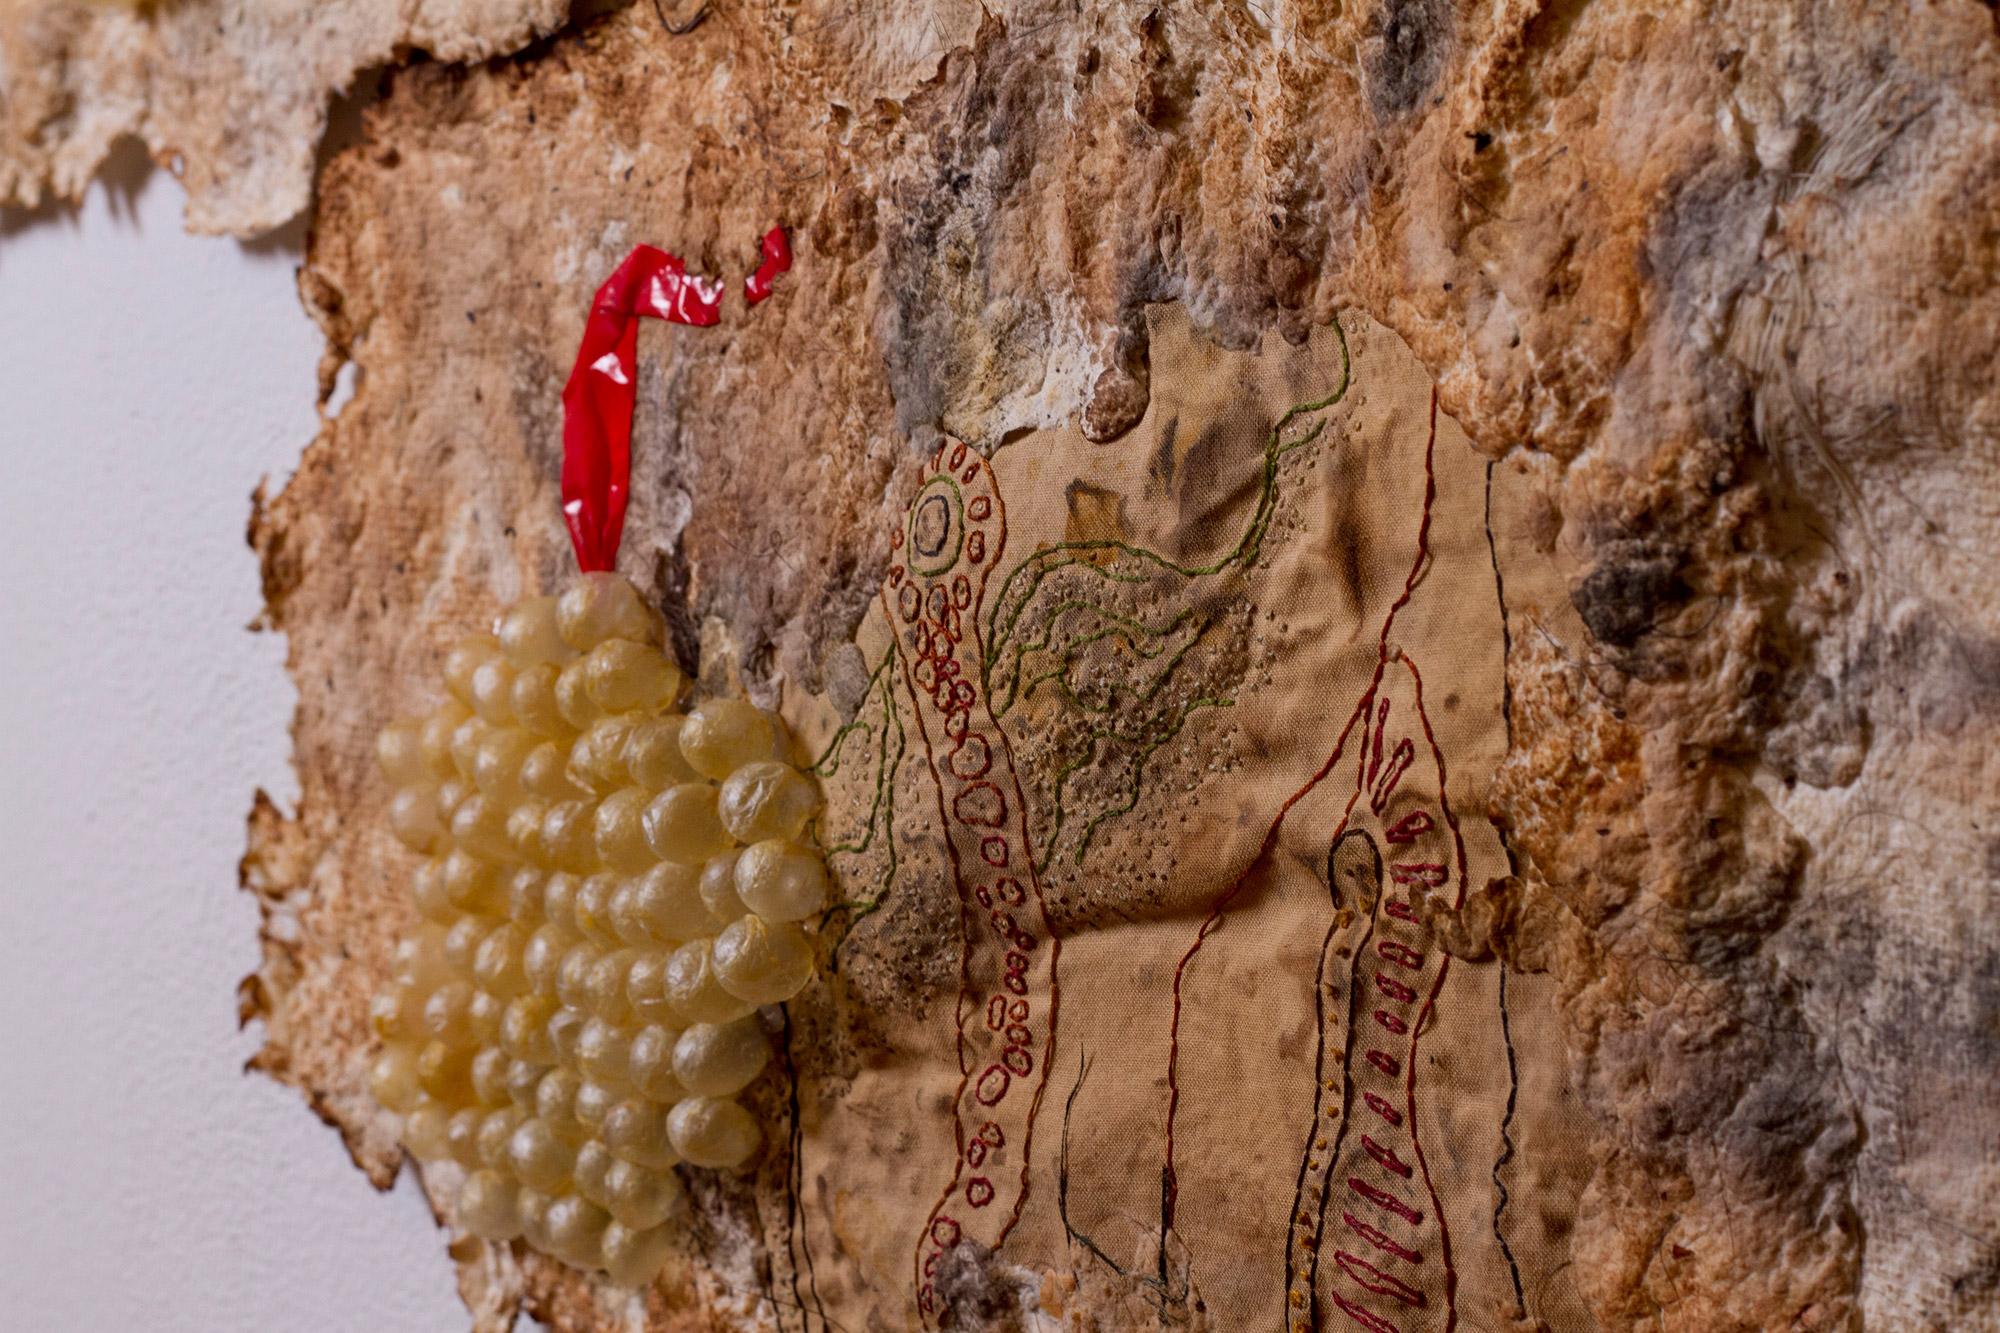 Heather Komus - Gorge and Grow - close-up intestine embroidery